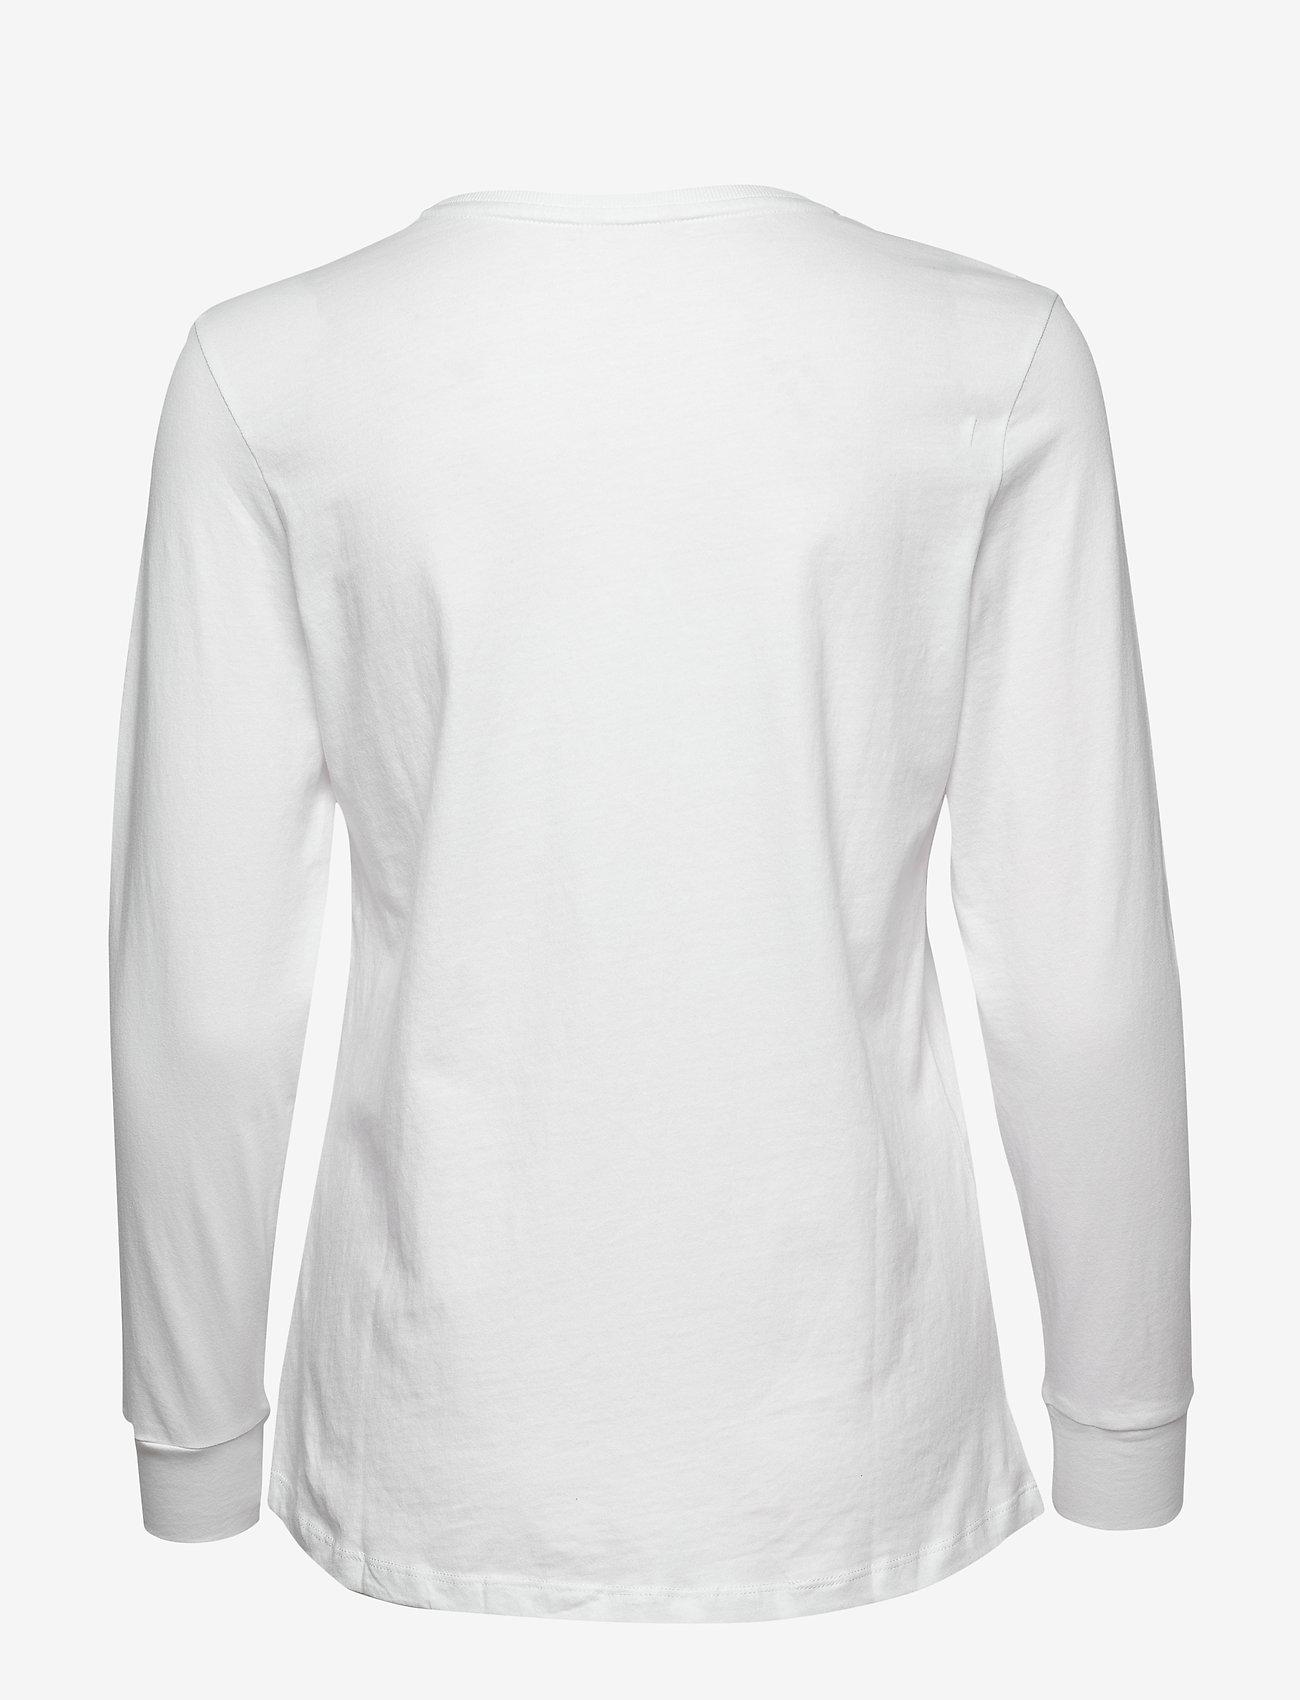 Esprit Bodywear Women - Night-T-Shirts - tops - white - 1